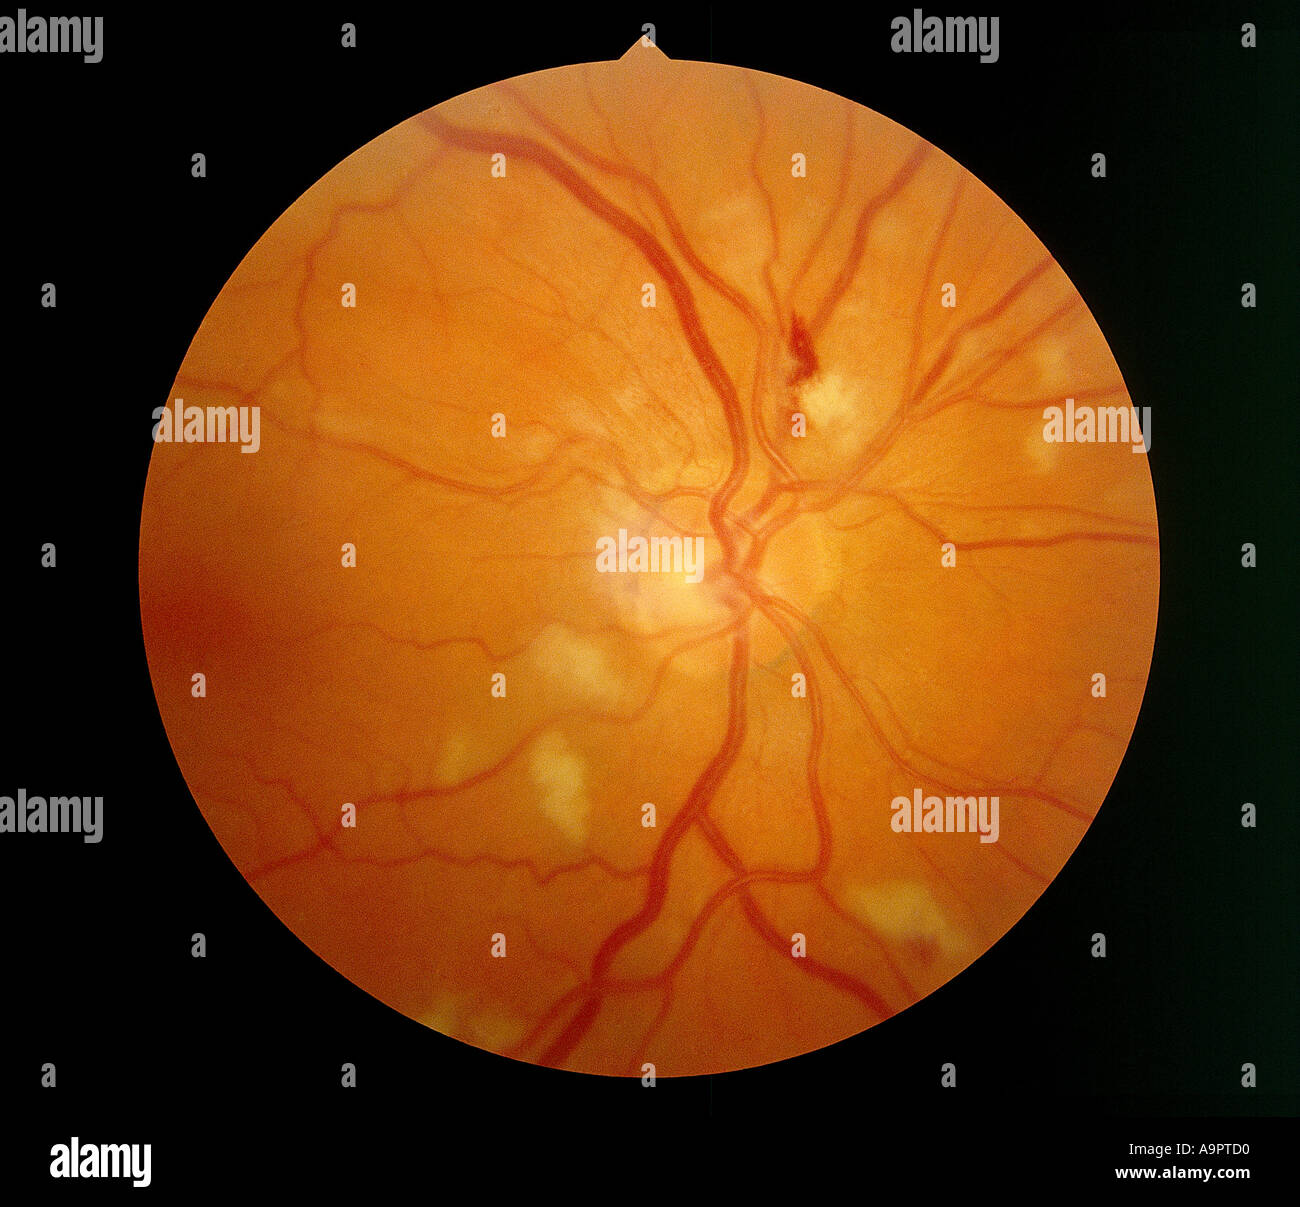 CMV retinitis Stock Photo